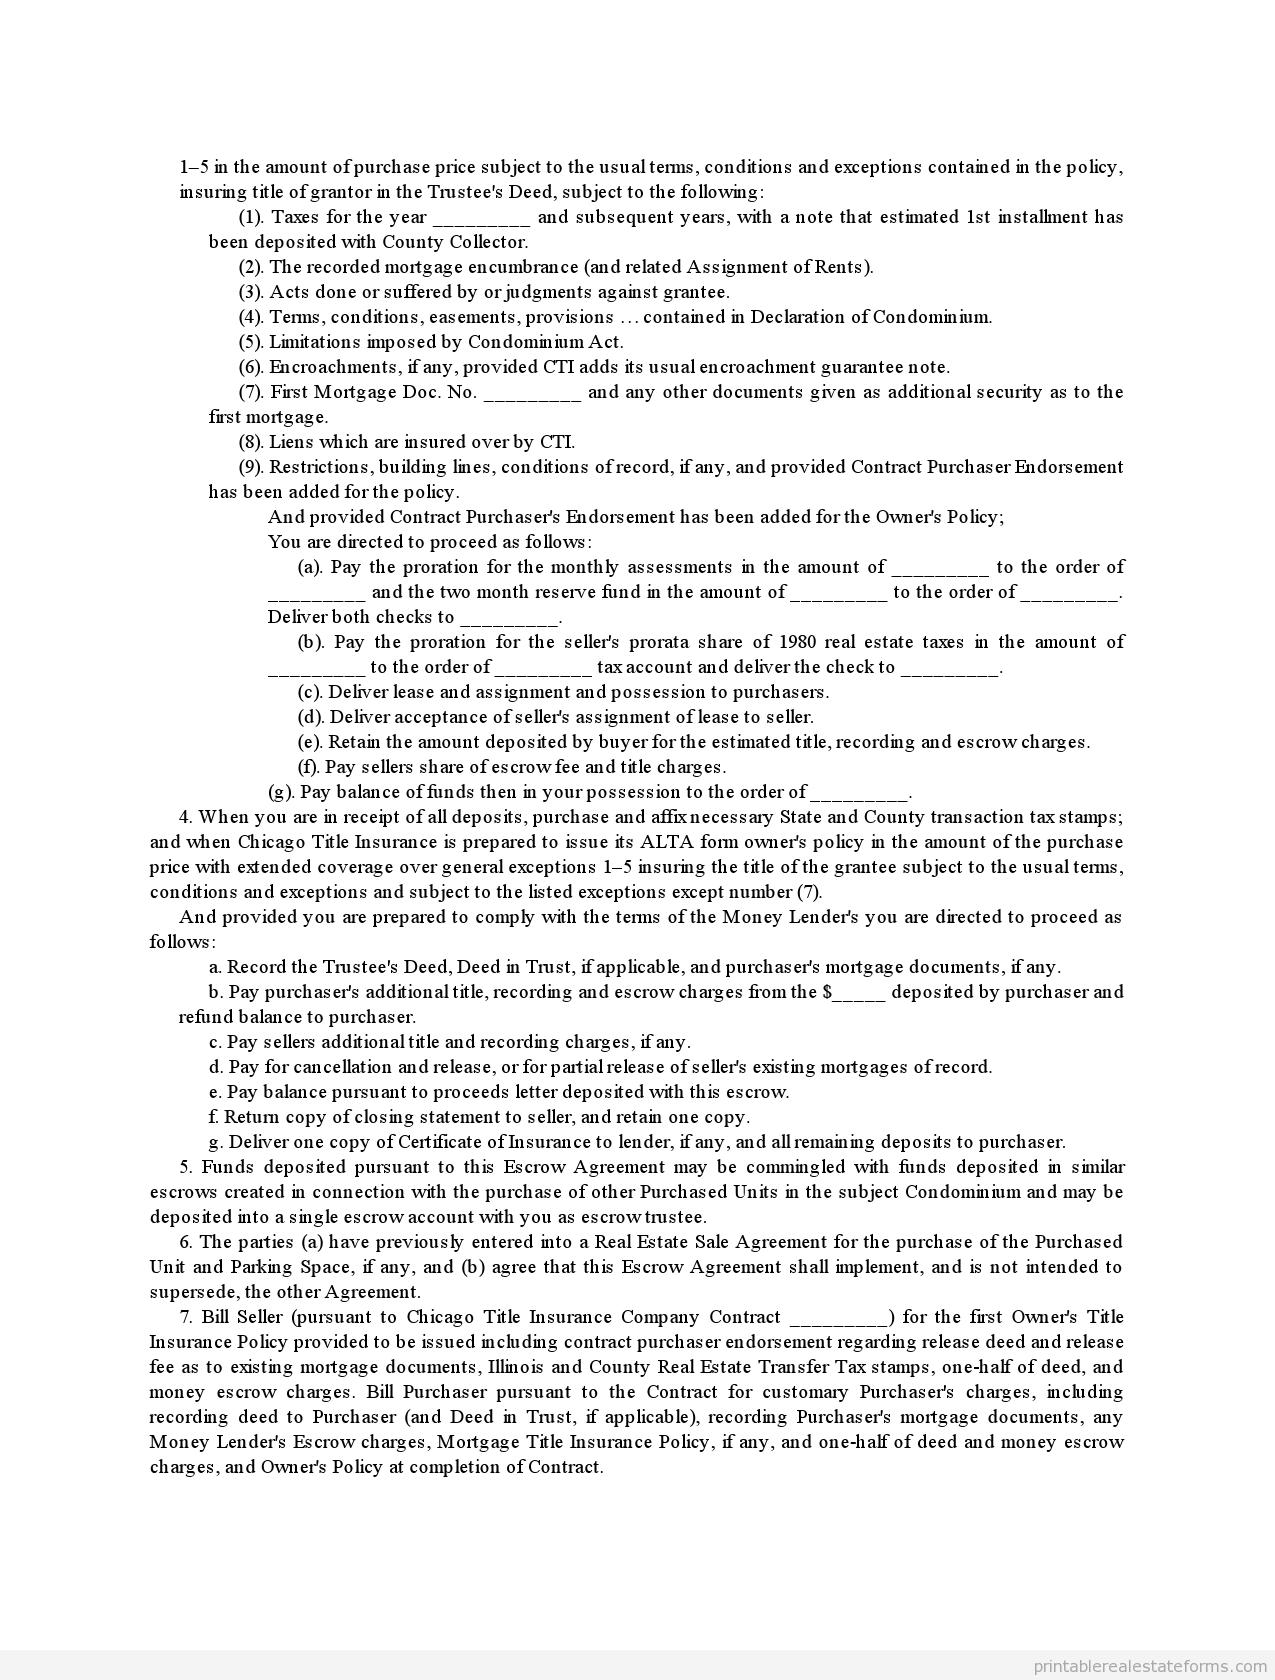 Printable Estate Sale Contract Template